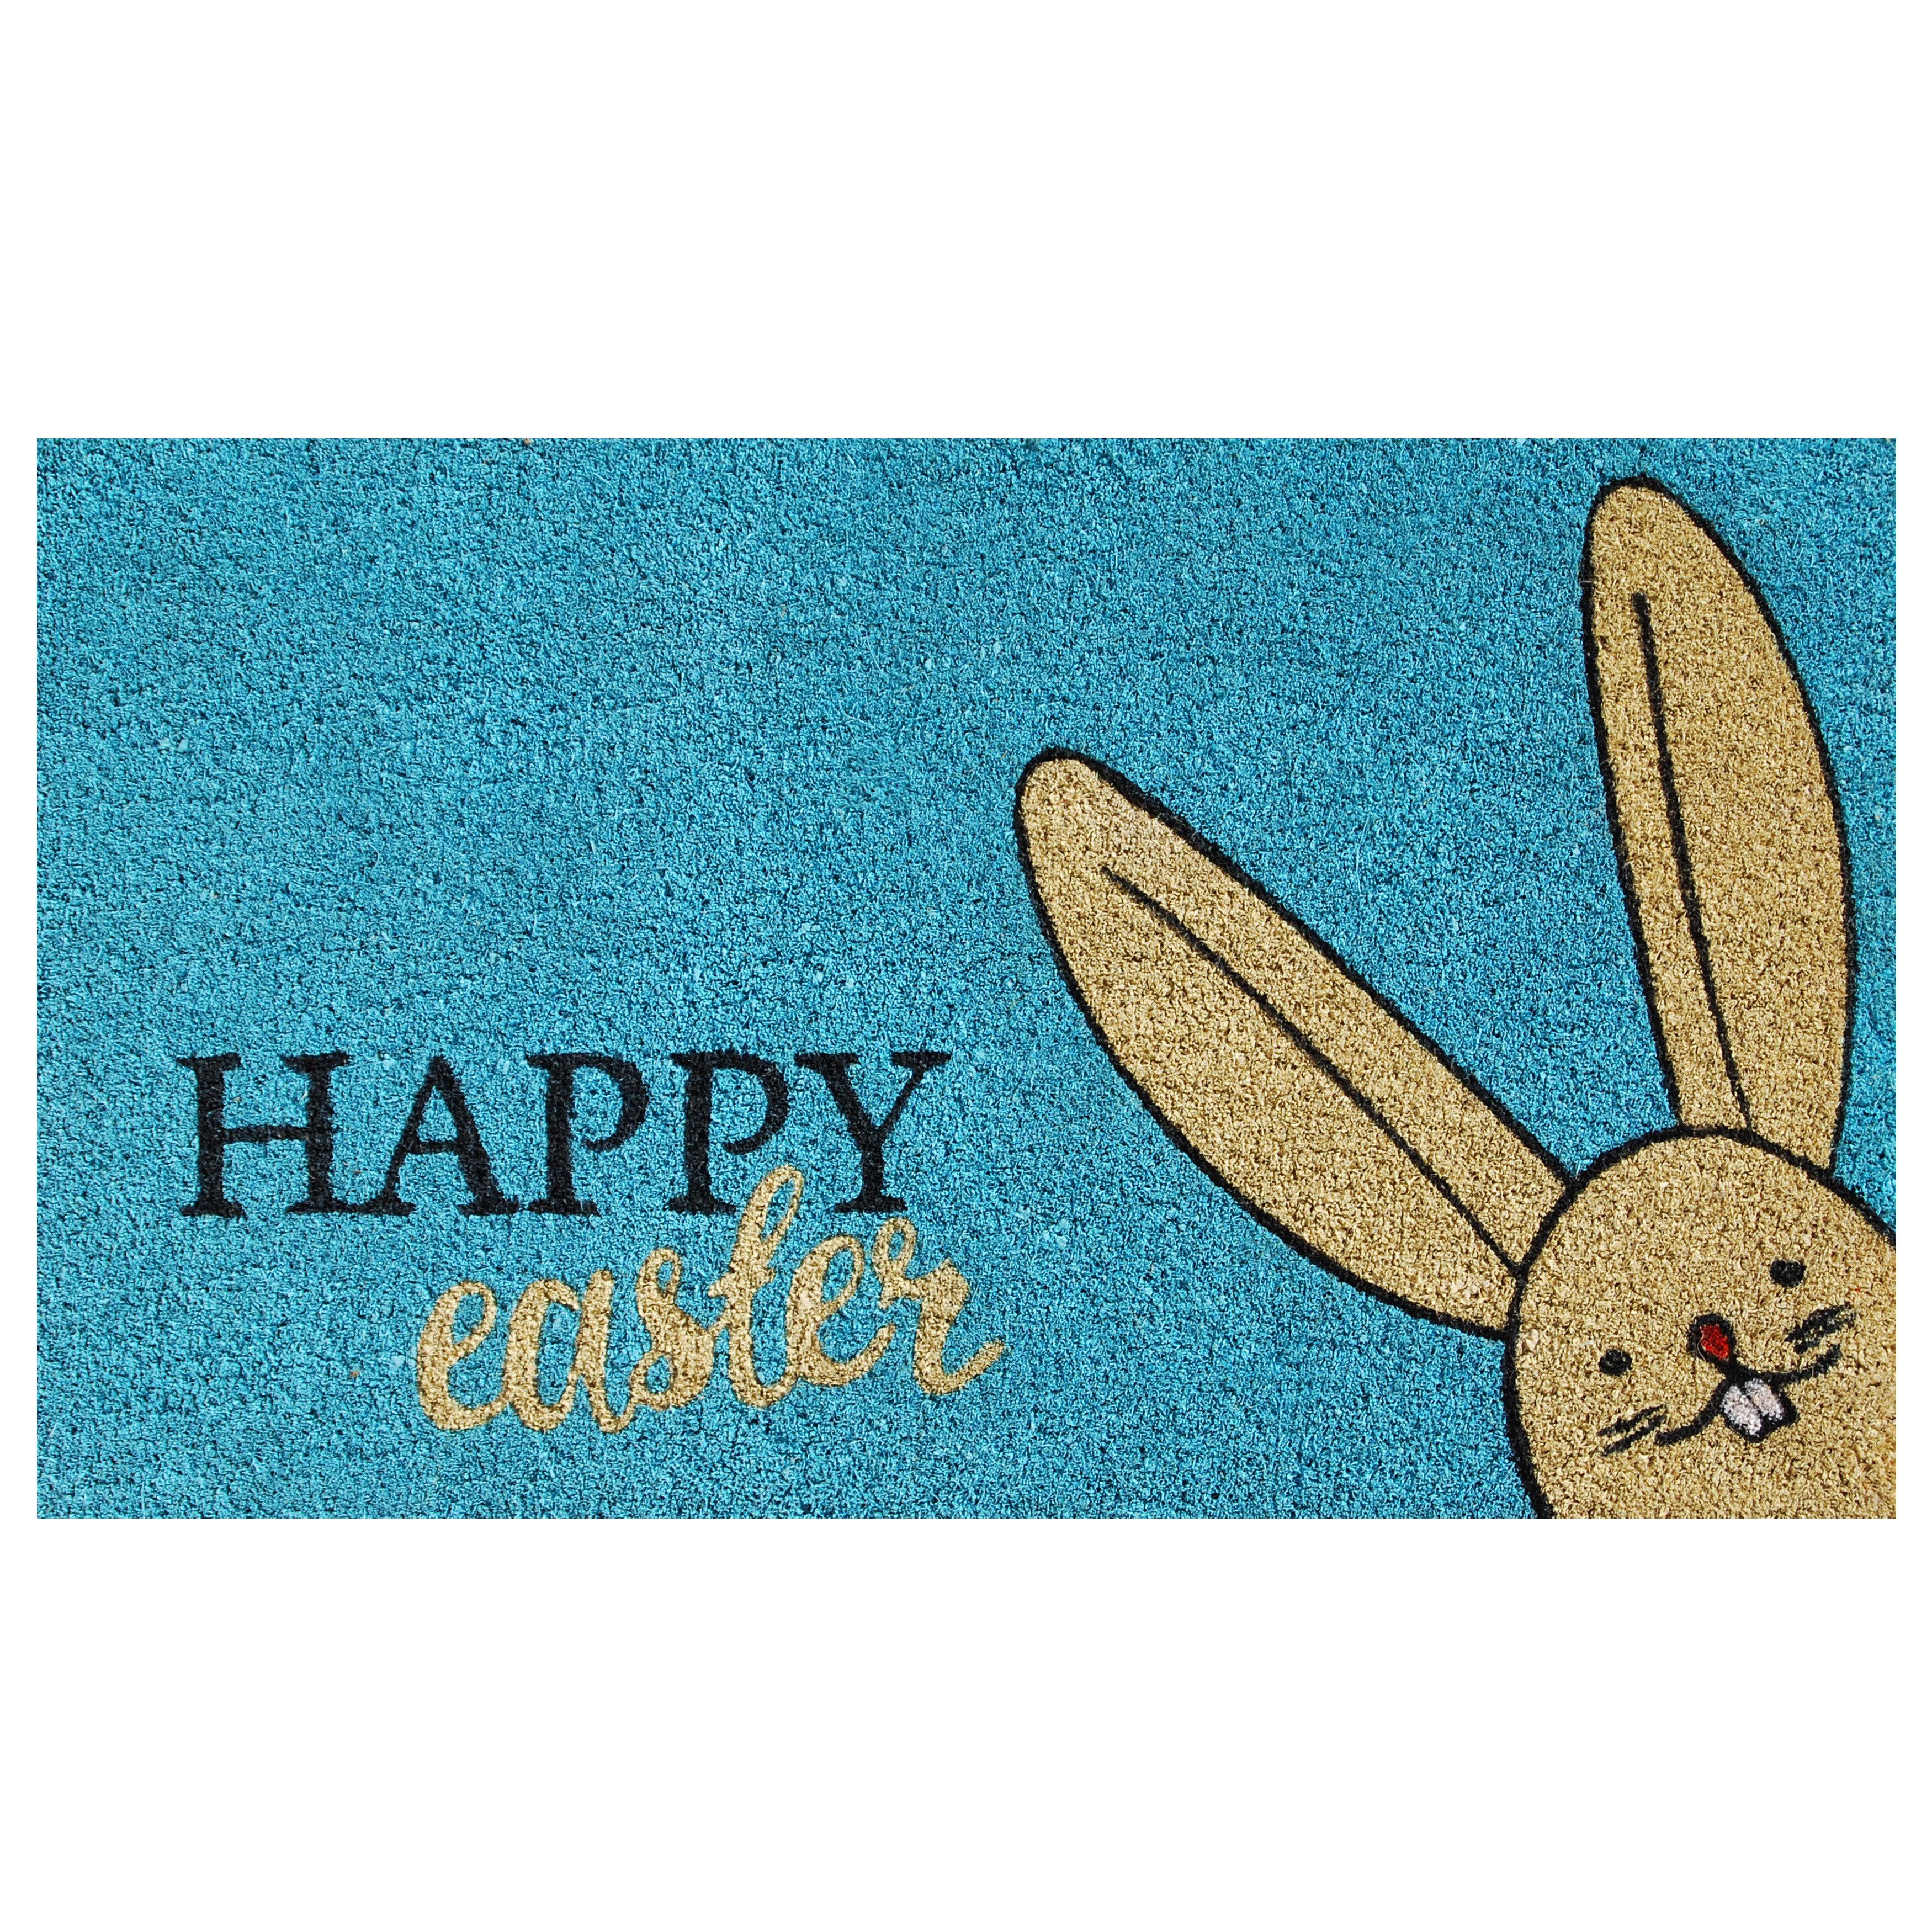 Easter Theme With Bunny and Egg Non-Slip Outdoor Indoor Front Door Mat bathroom